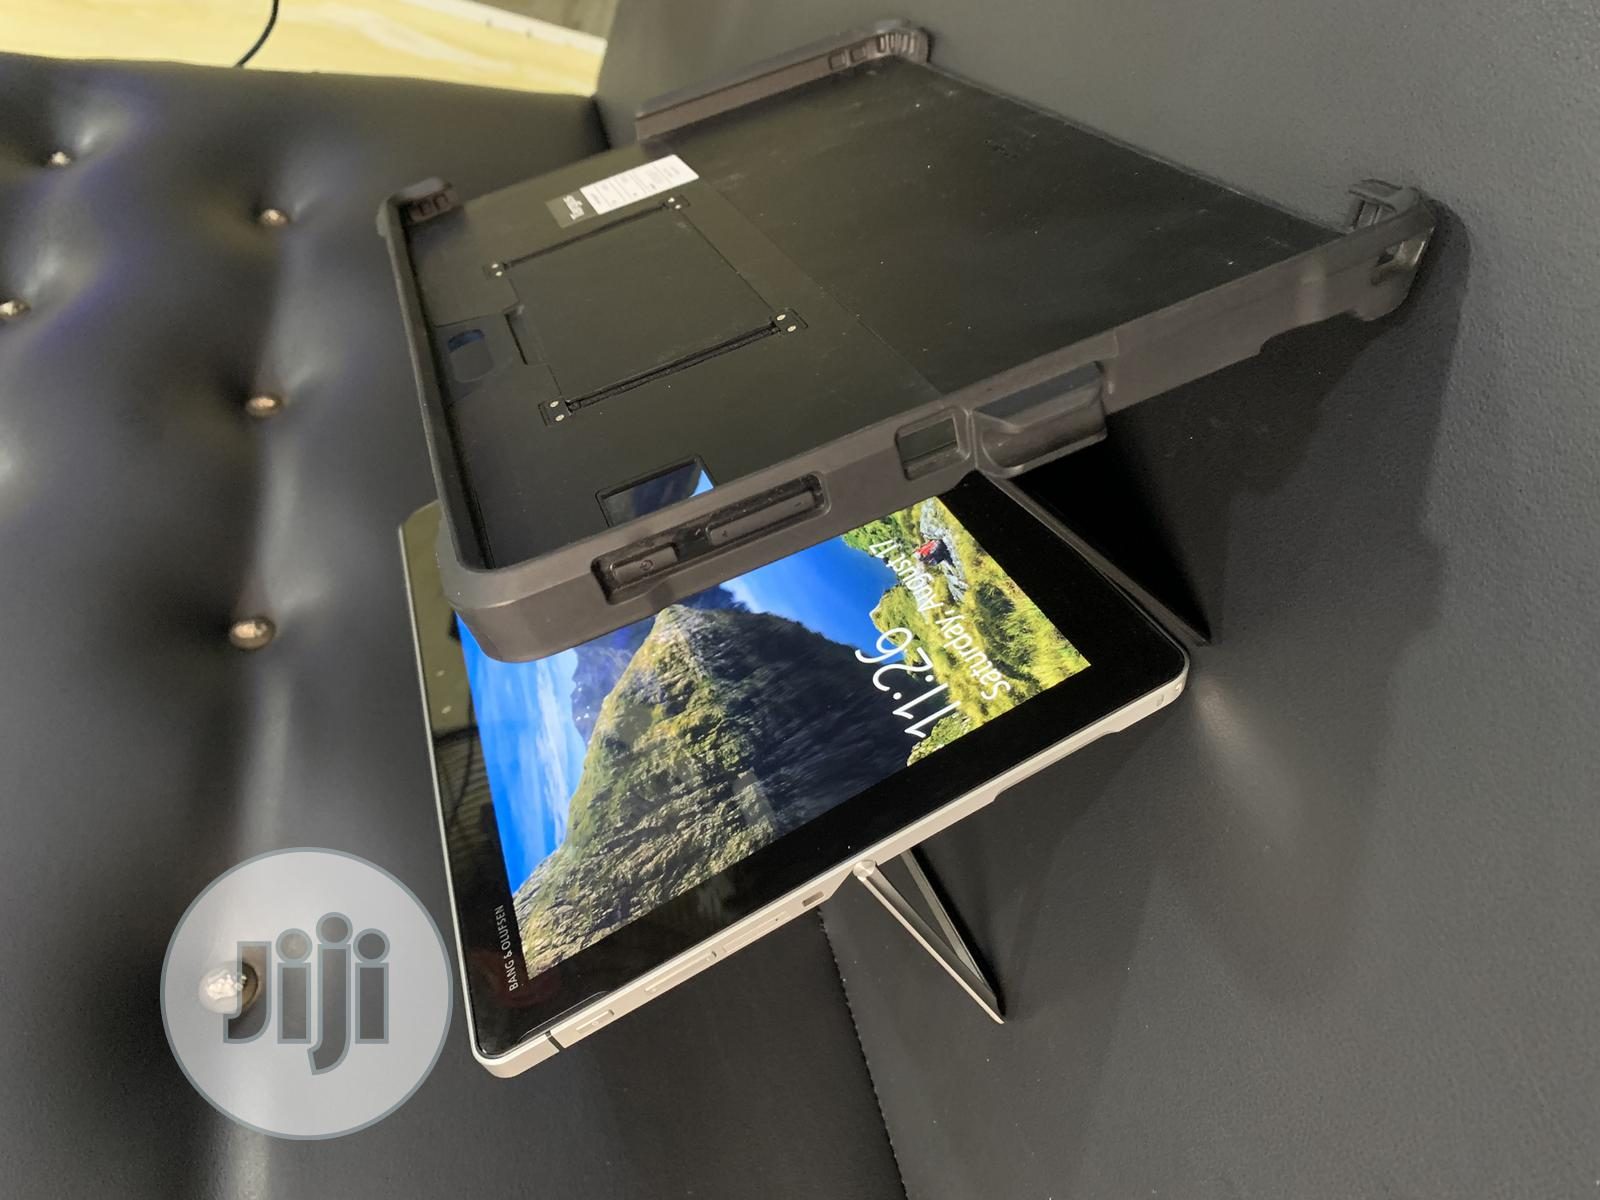 Laptop HP Elite X2 1012 G2 8GB Intel Core I5 SSD 256GB | Laptops & Computers for sale in Ikeja, Lagos State, Nigeria